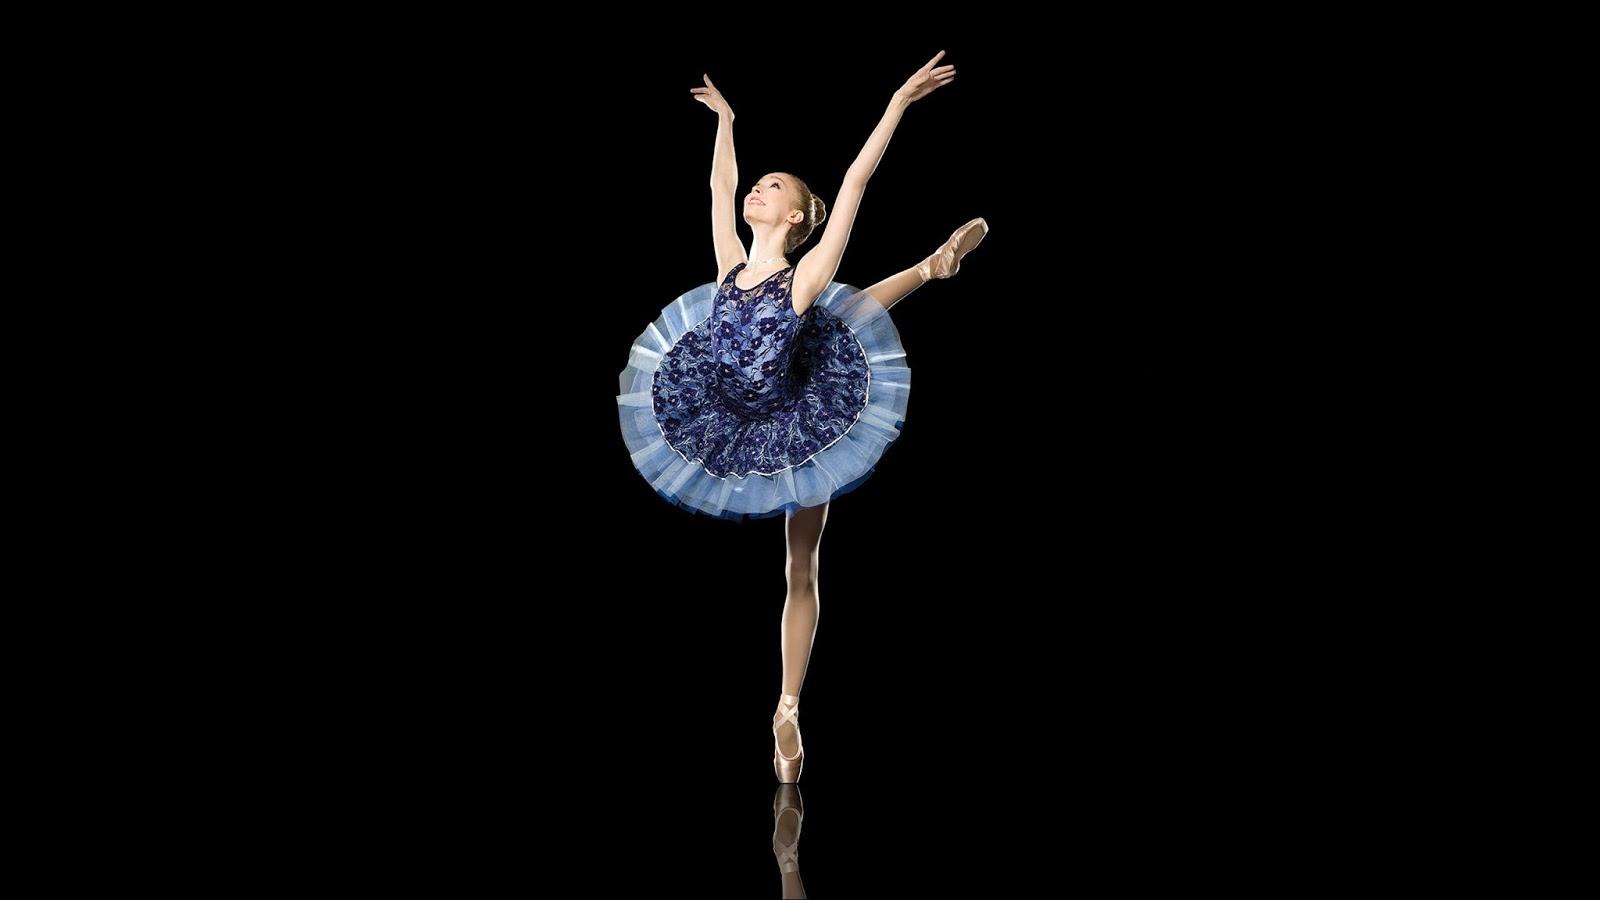 Ballet Dance Wallpapers Hd Resolution Dodskypict: Cool Desktop Wallpapers